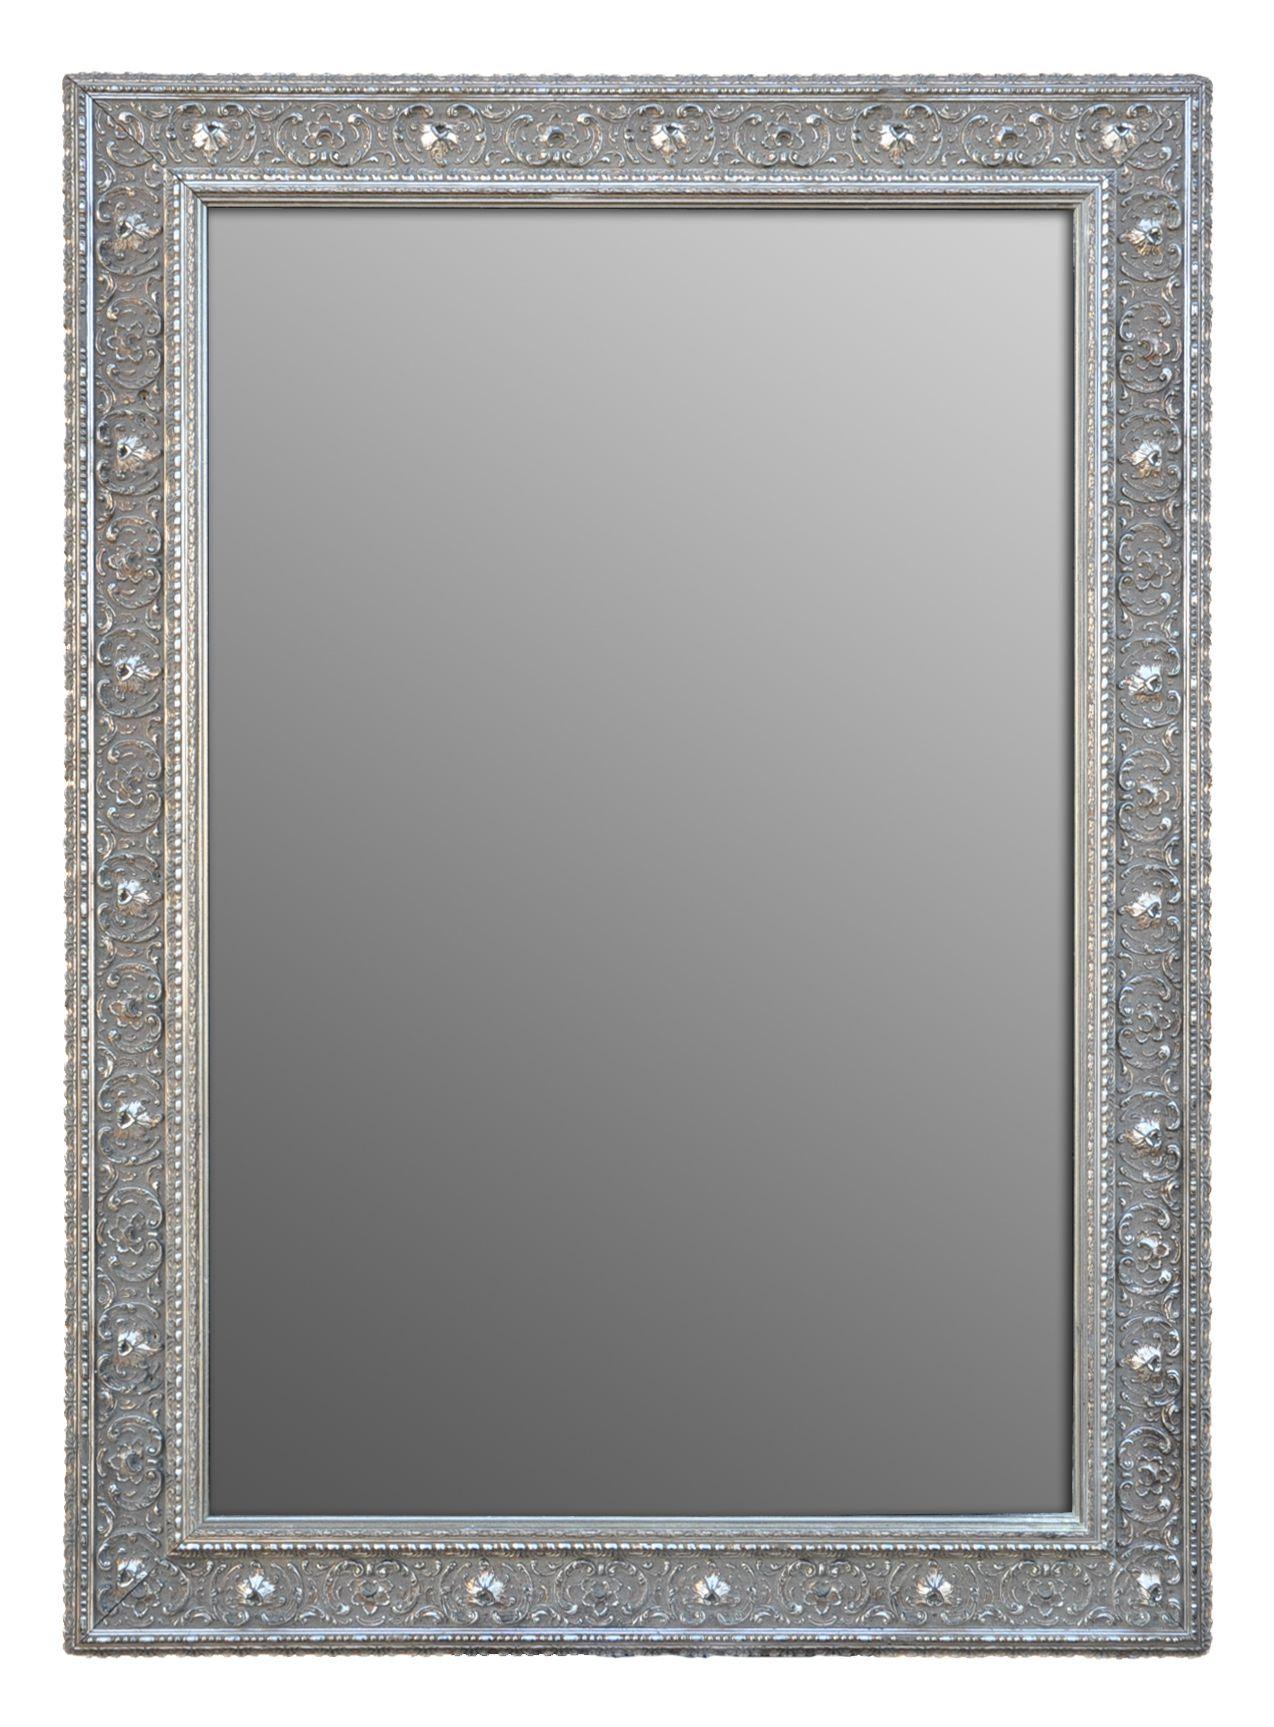 Antique frame mirror 2 home inspirations pinterest frame antique frame mirror 2 jeuxipadfo Image collections